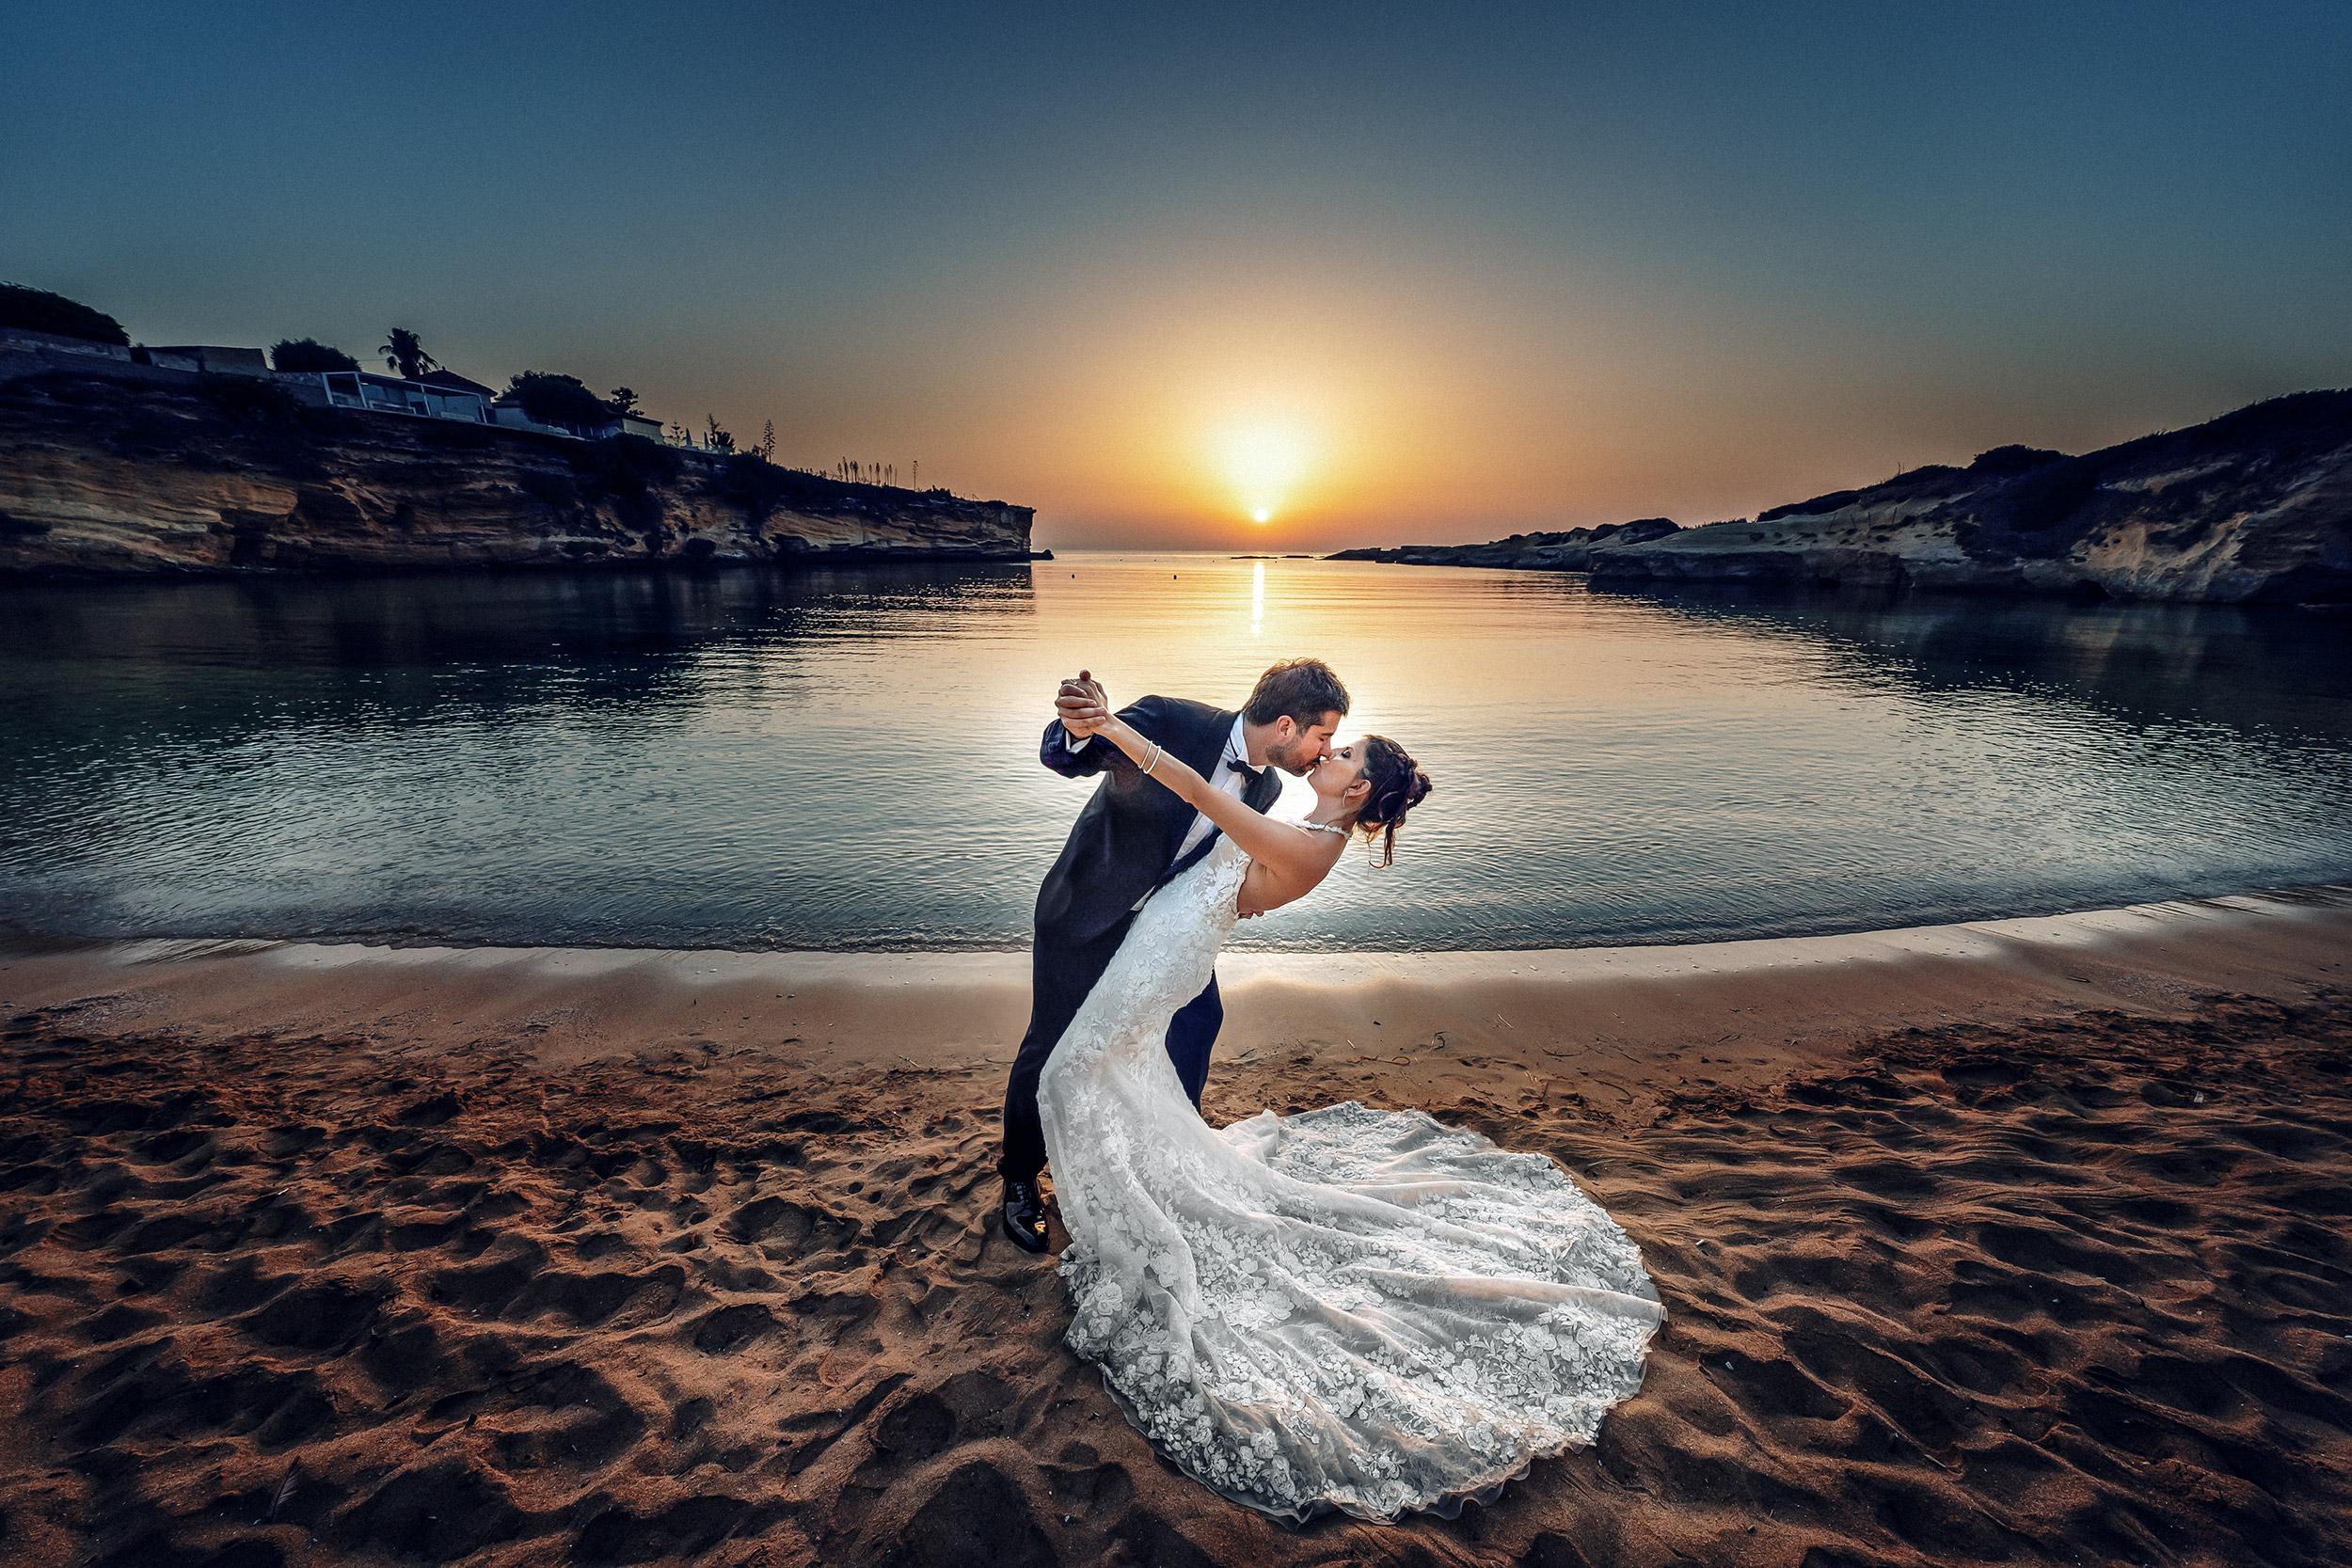 000 fotografo matrimonio reportage destination wedding italy italy newlyweds sunrise sea beach siracusa sicily italy 2